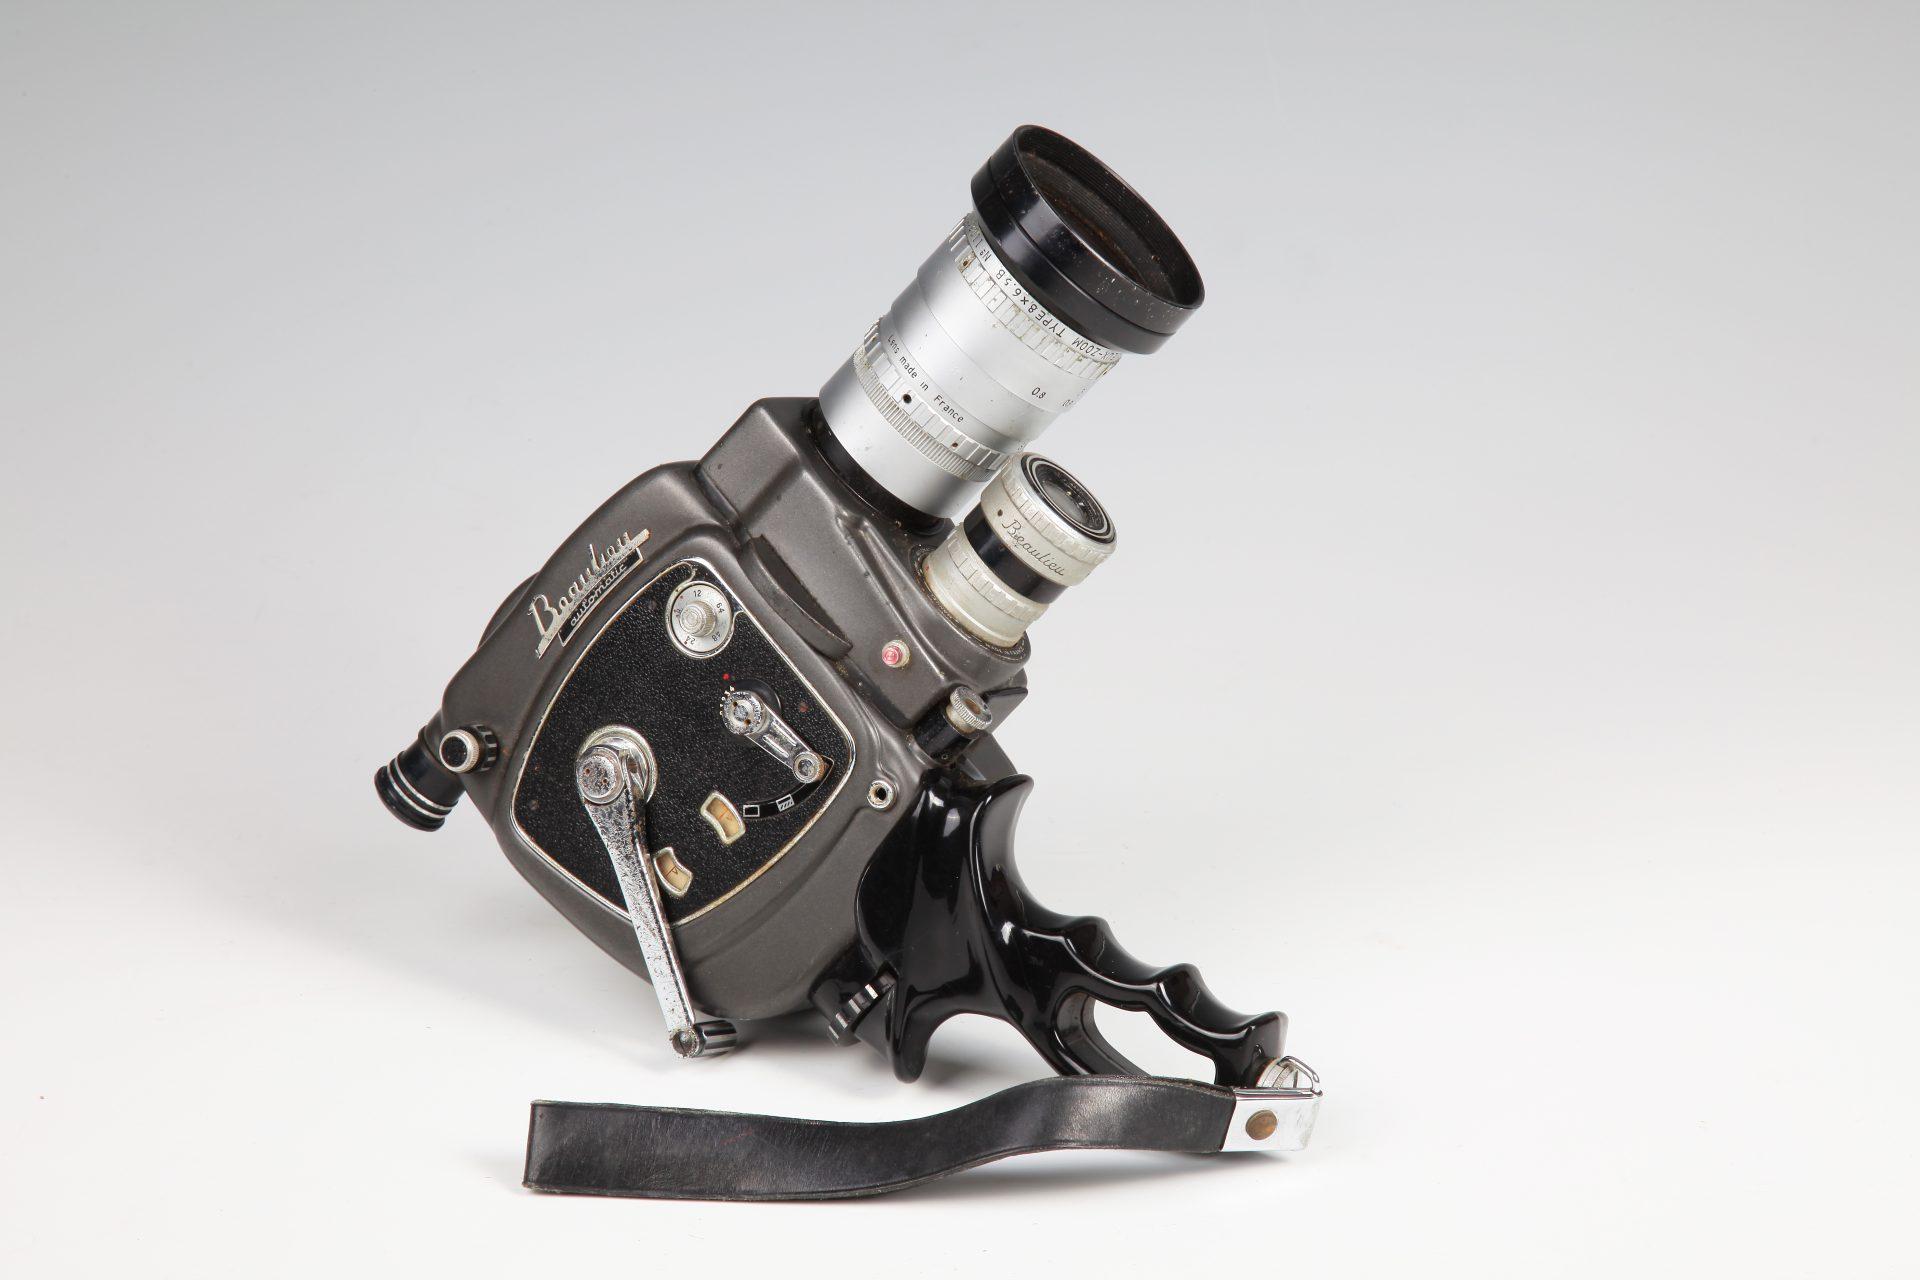 Kino kamera BEAULIEU MAR8 AUTOMATIC